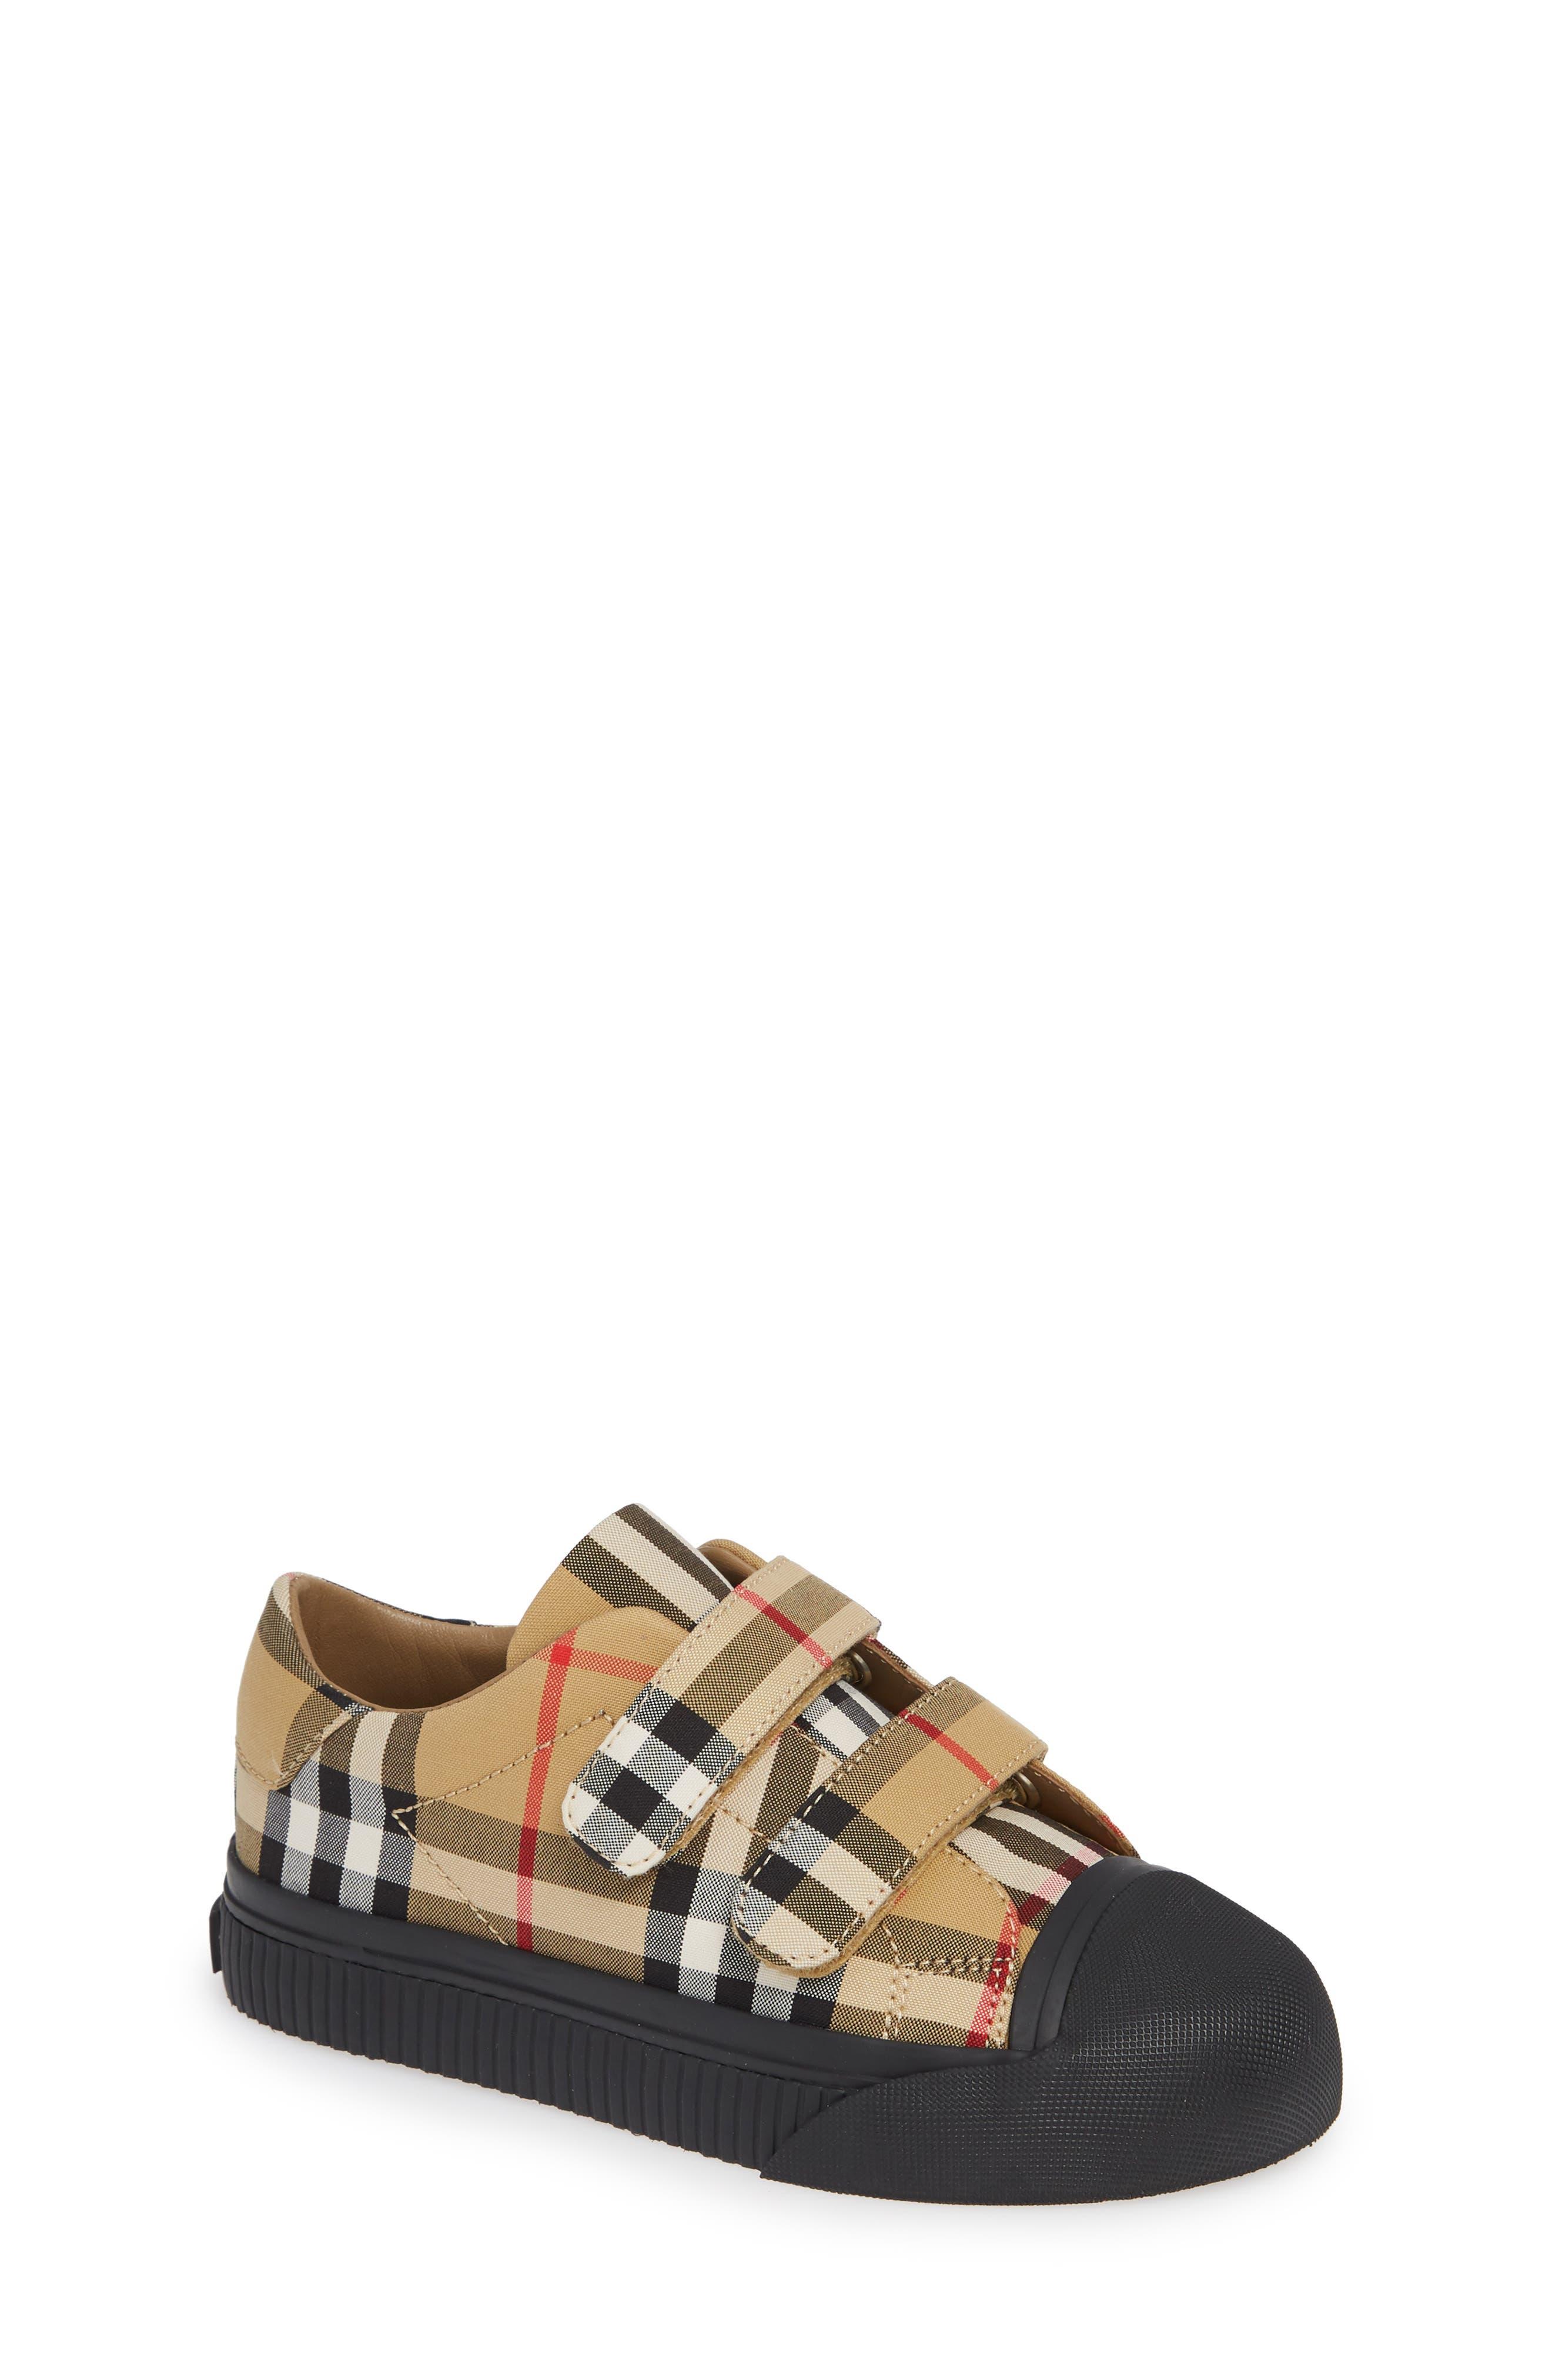 Belside Sneaker,                         Main,                         color, ANTIQUE YELLOW/ BLACK